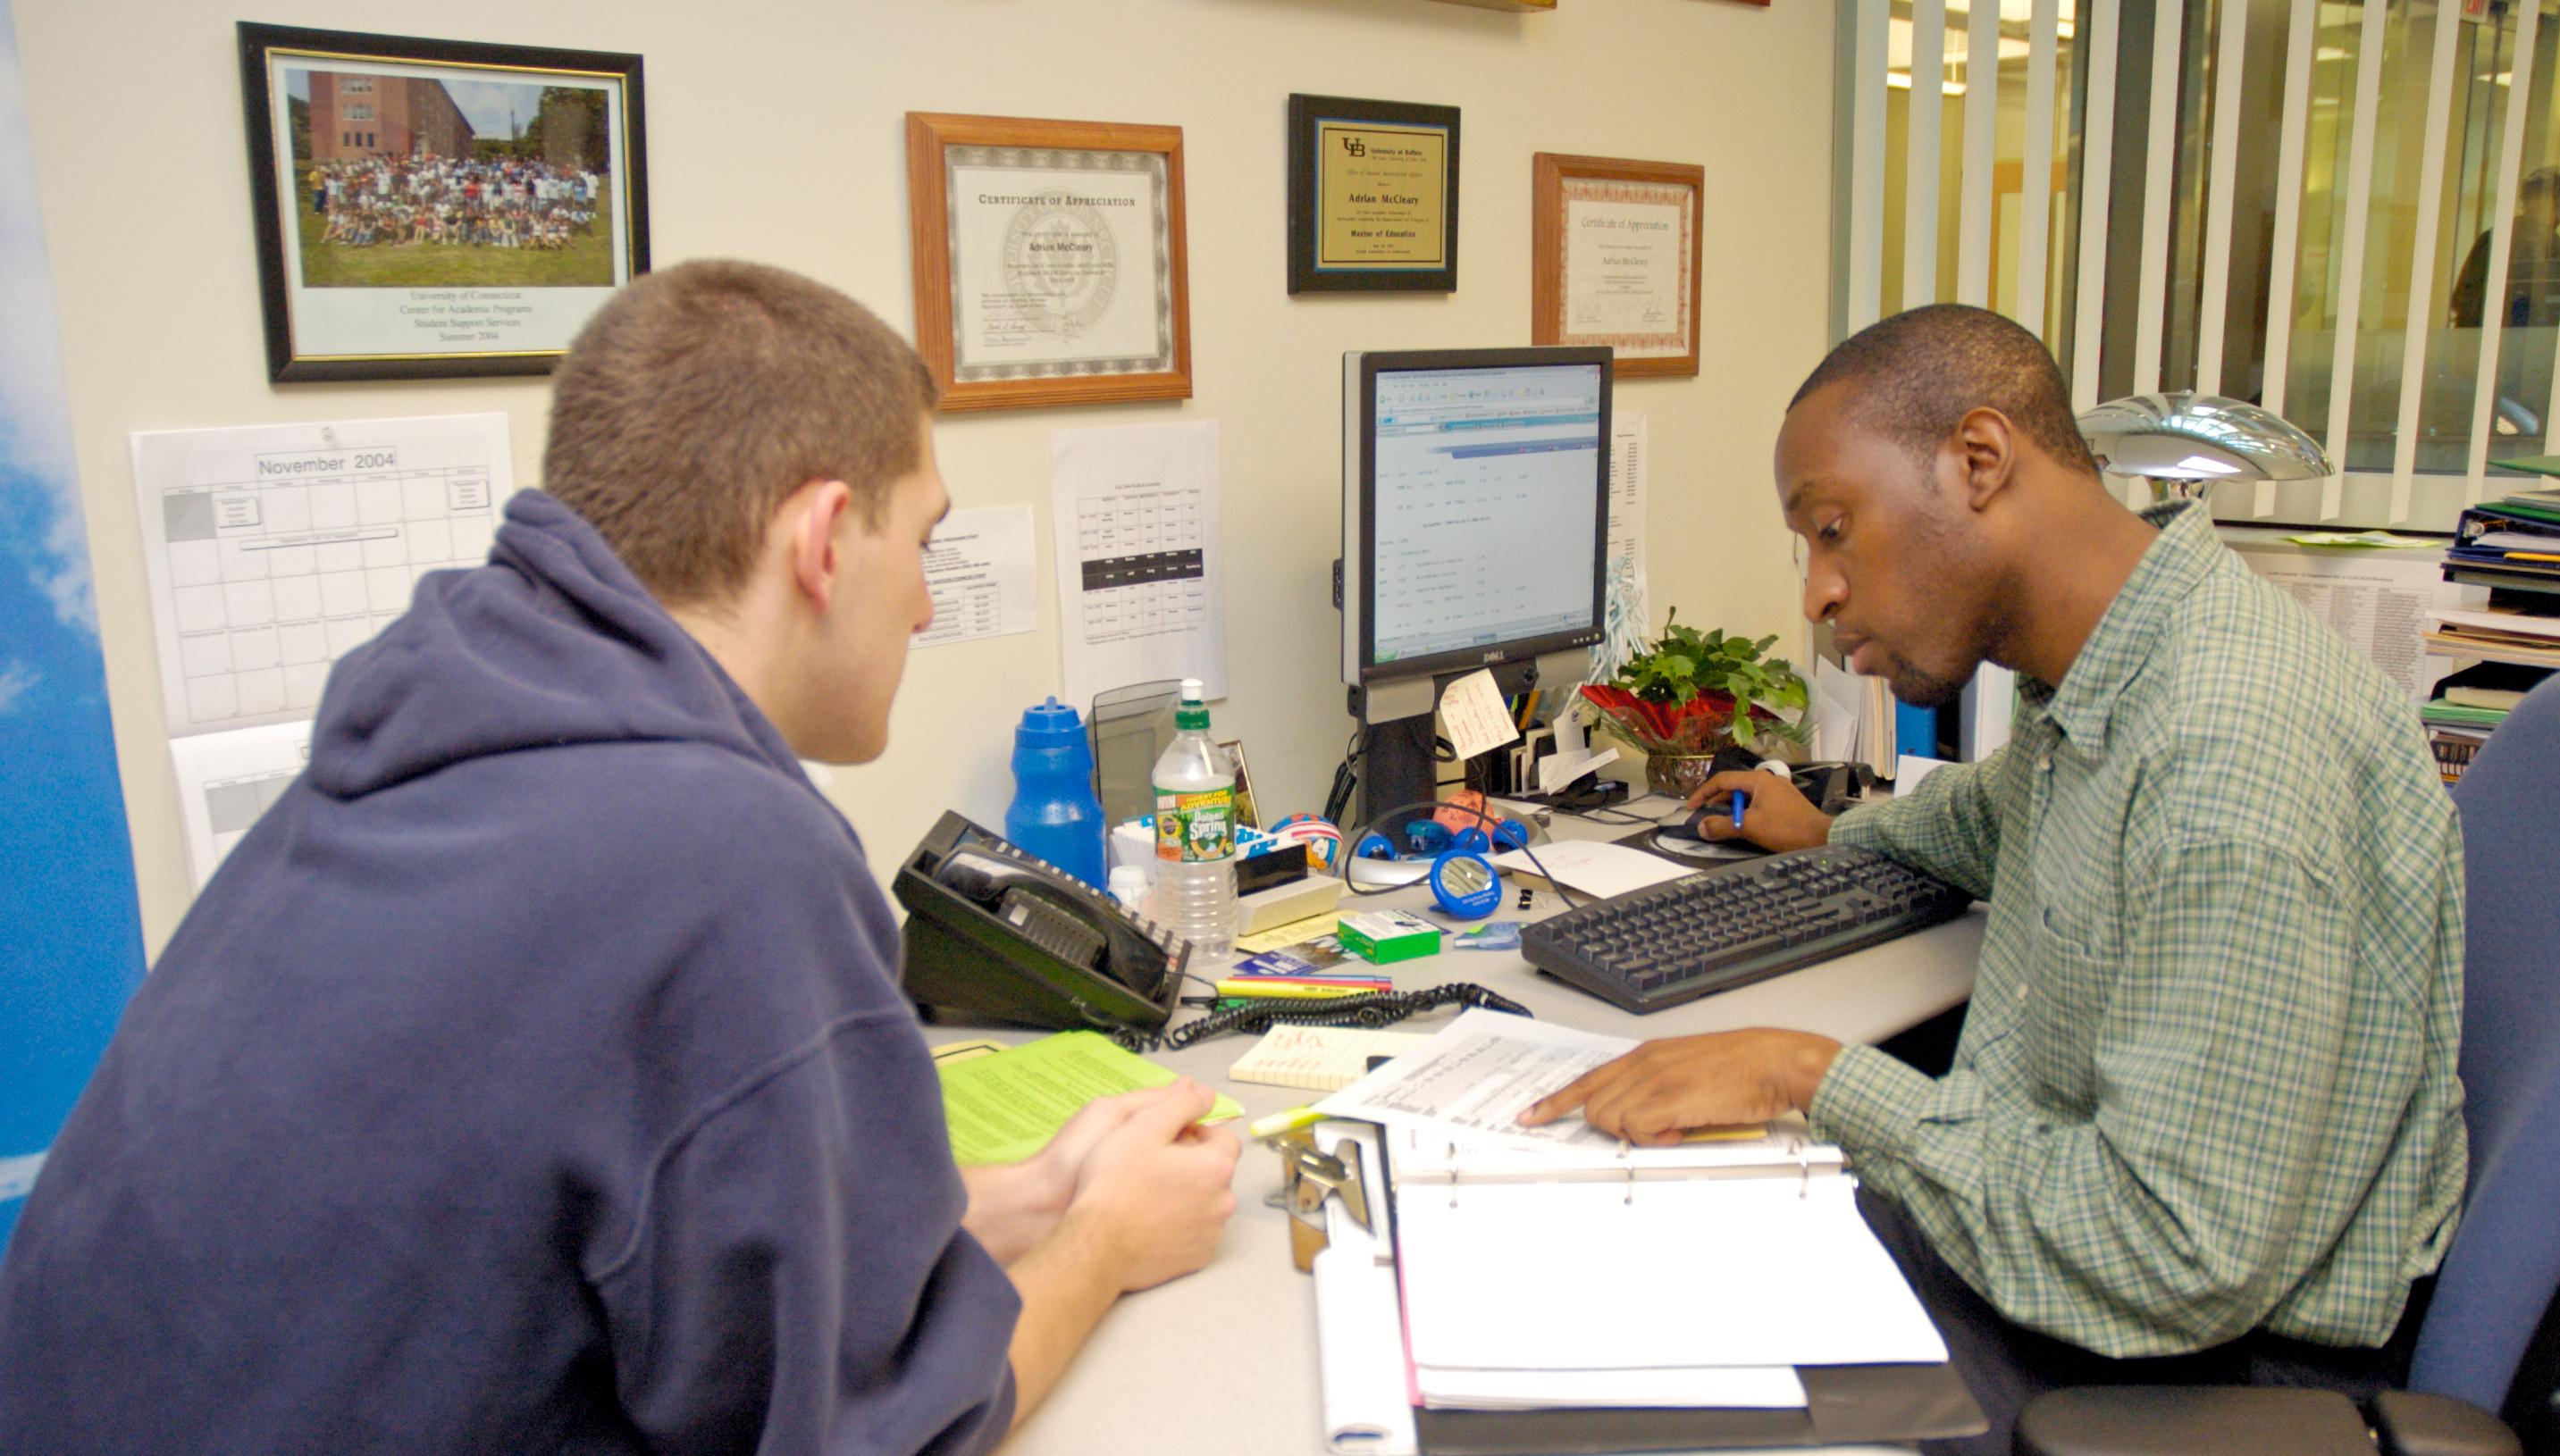 Advising students